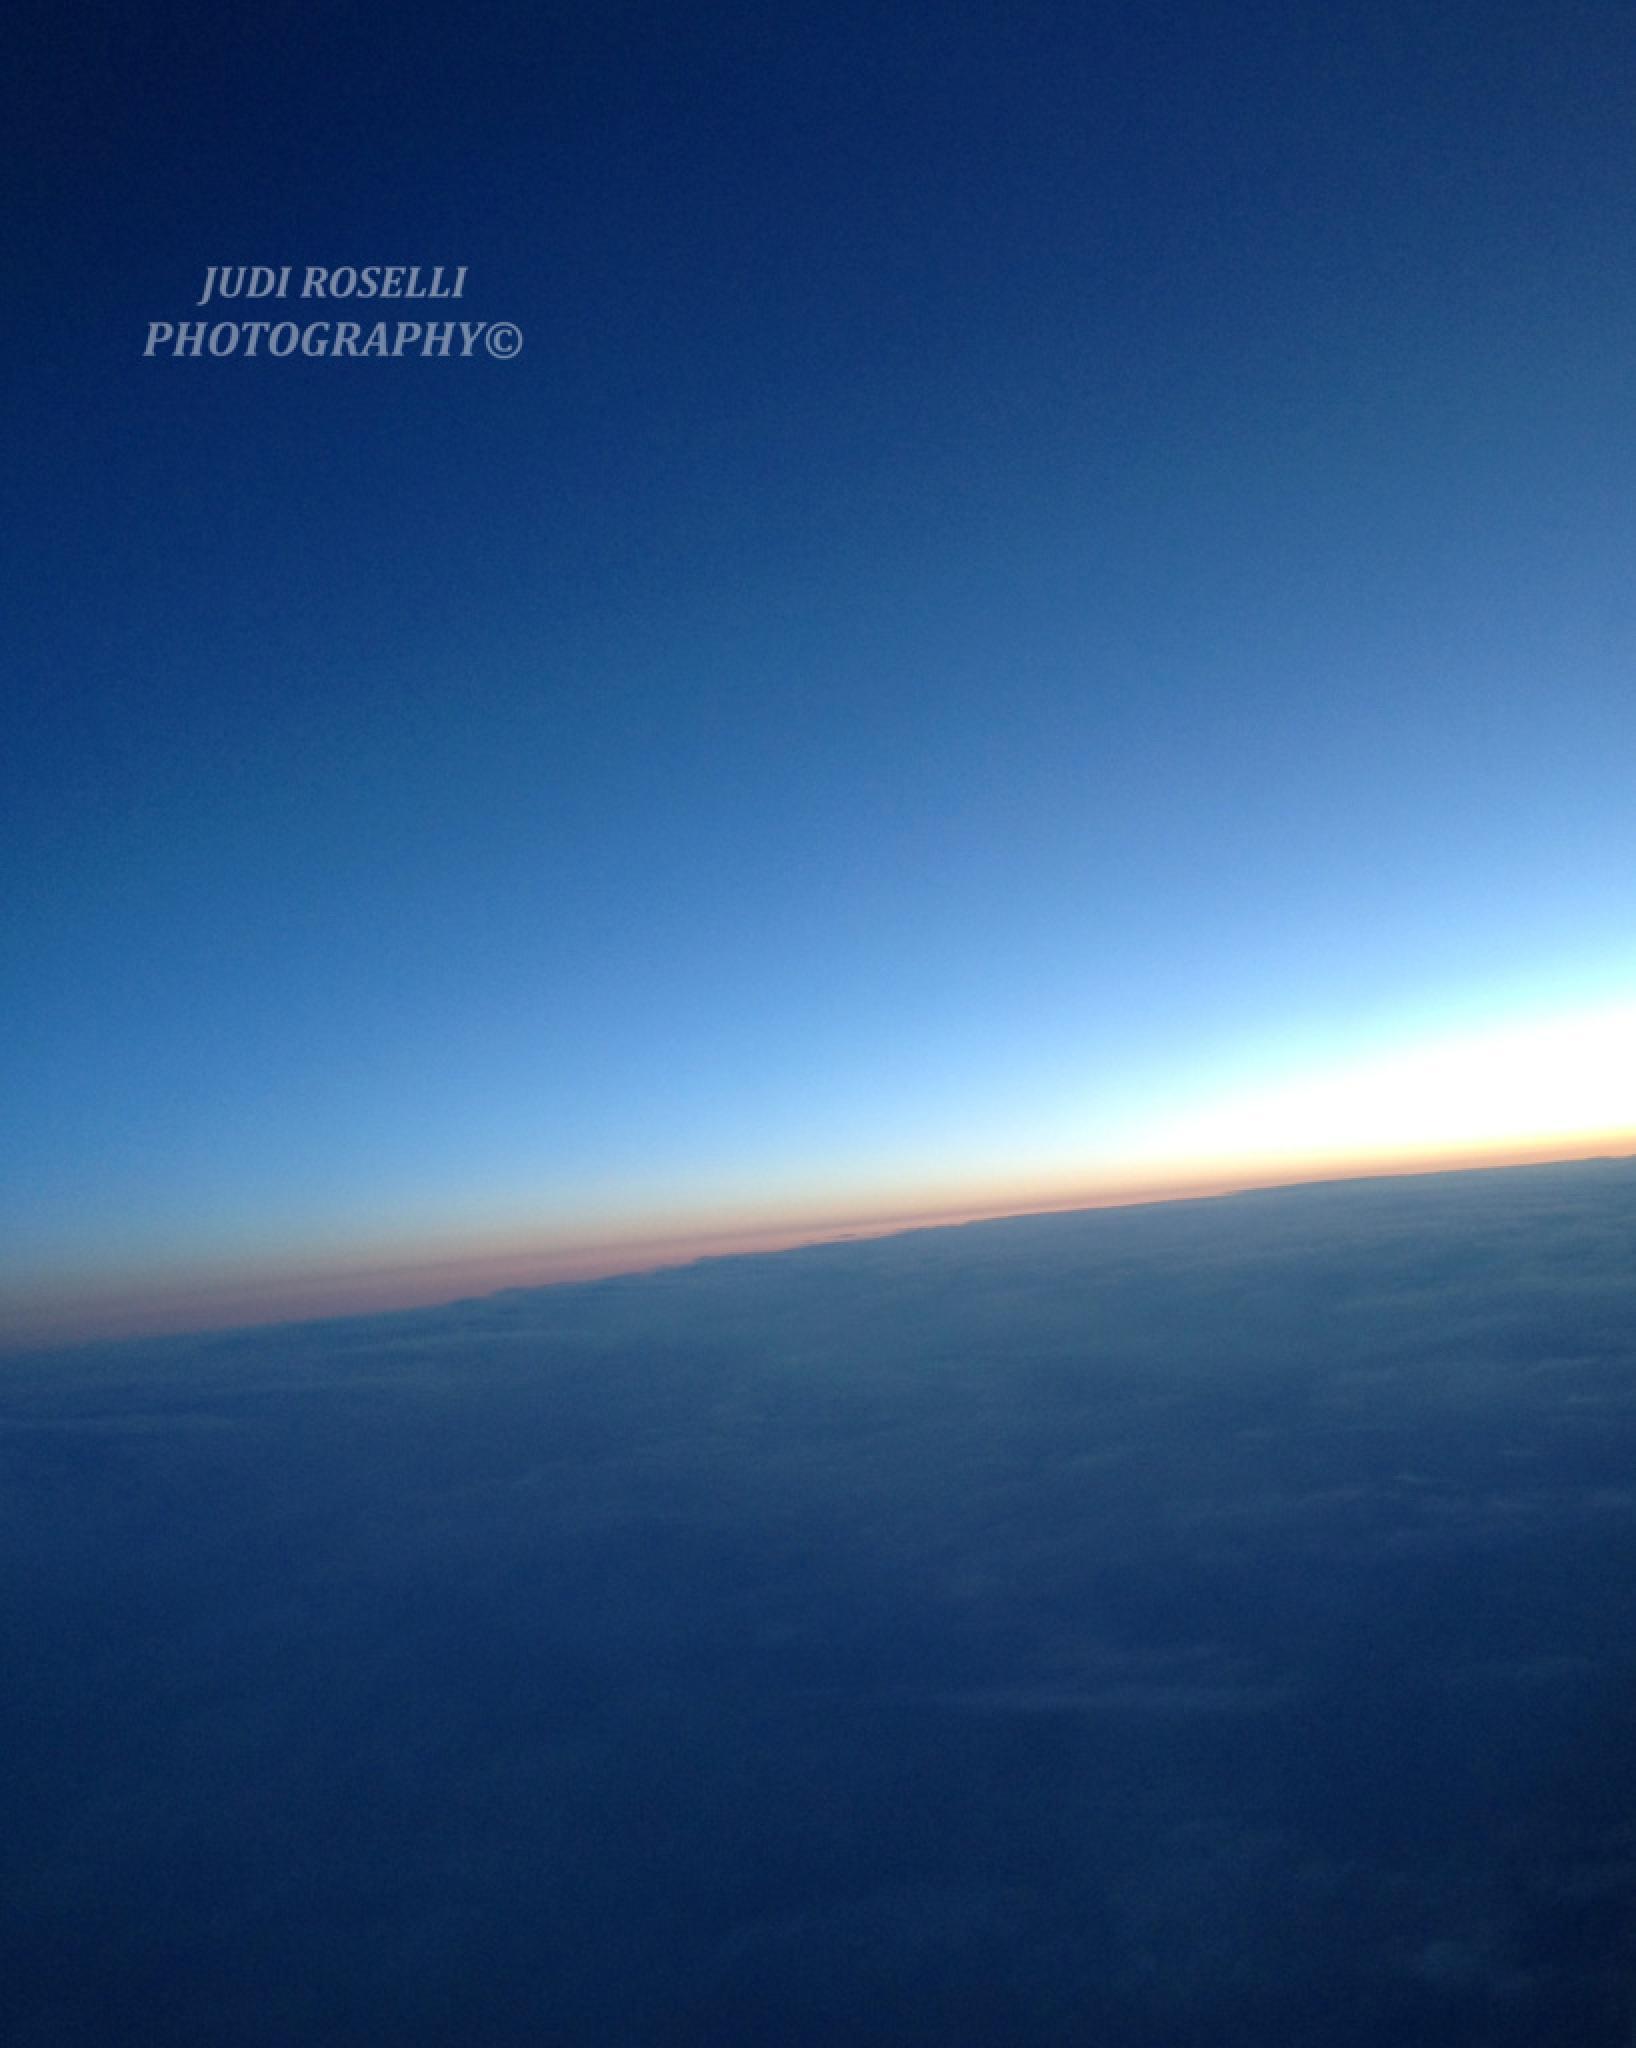 SUN RISING ABOVE THE CLOUDS by JUDI ROSELLI